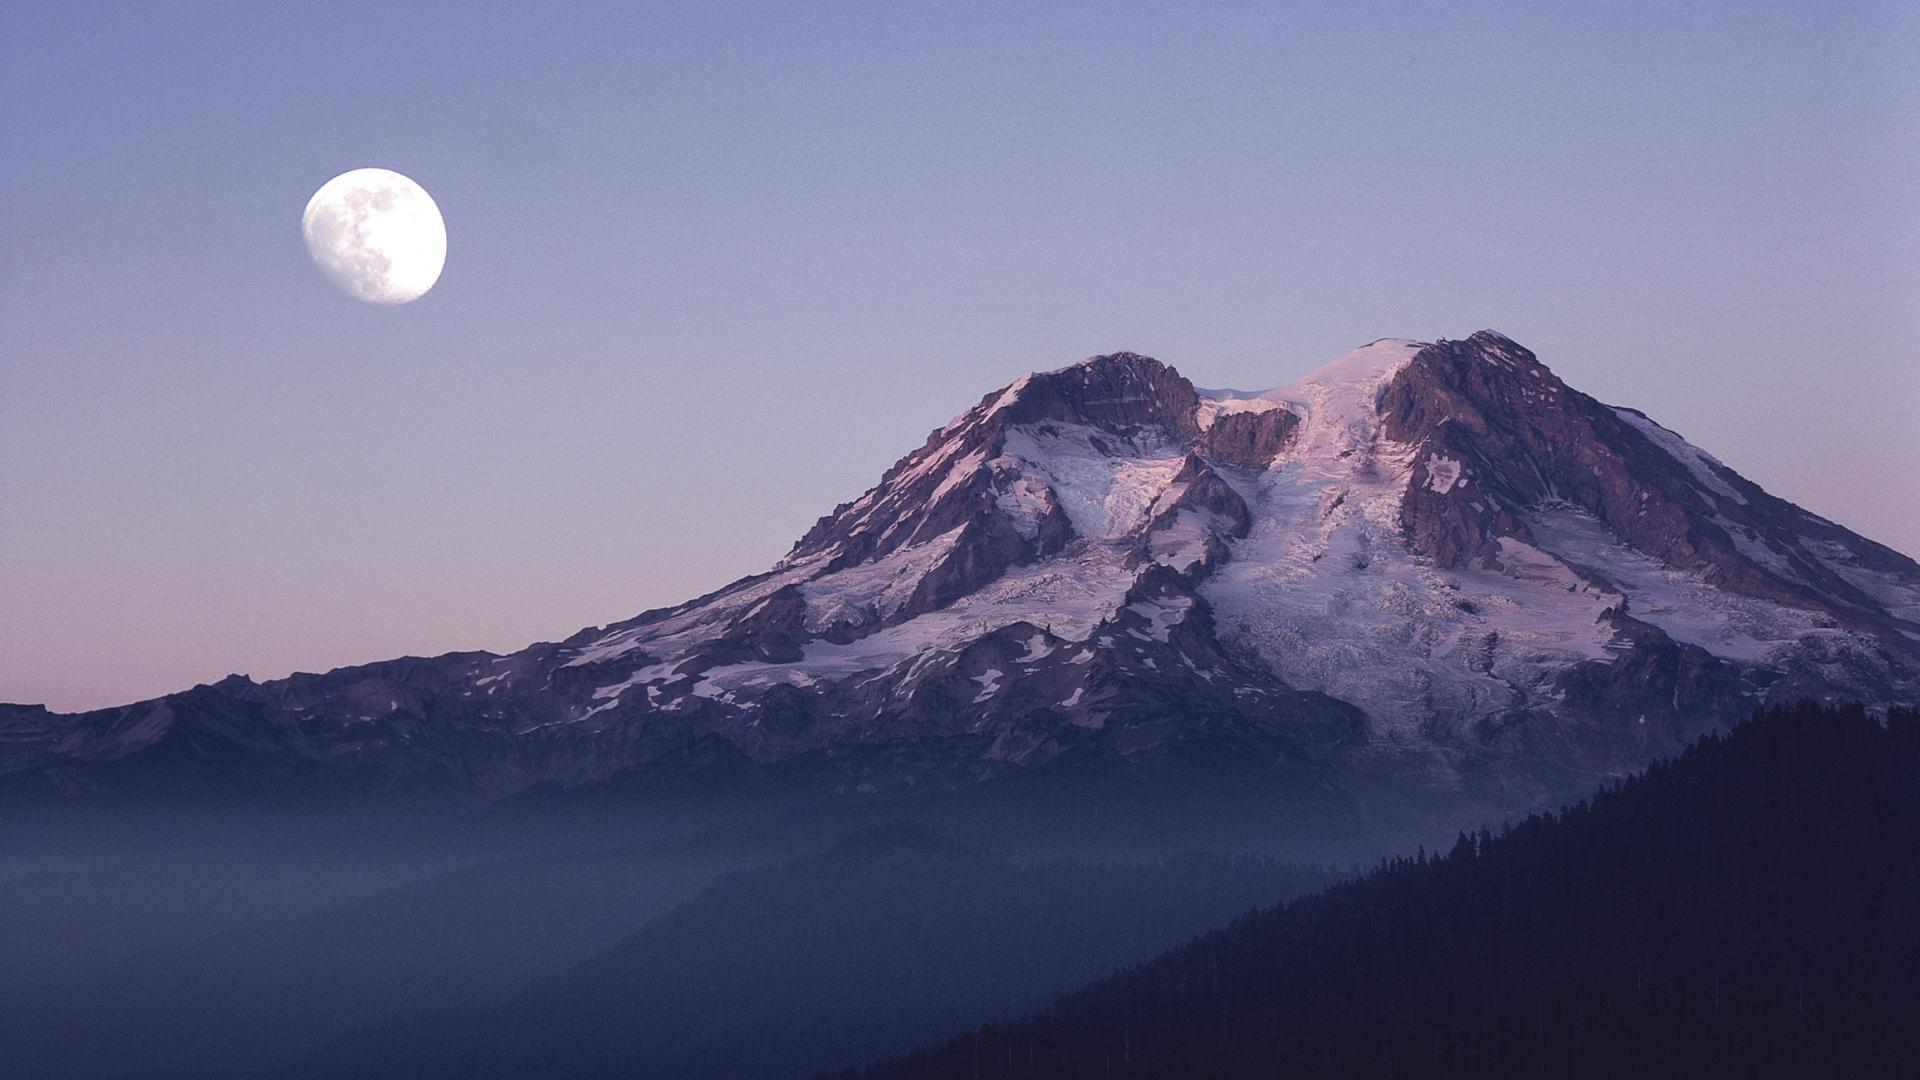 Download Wallpaper 1920x1080 Mountains, Top, Moon, Snow